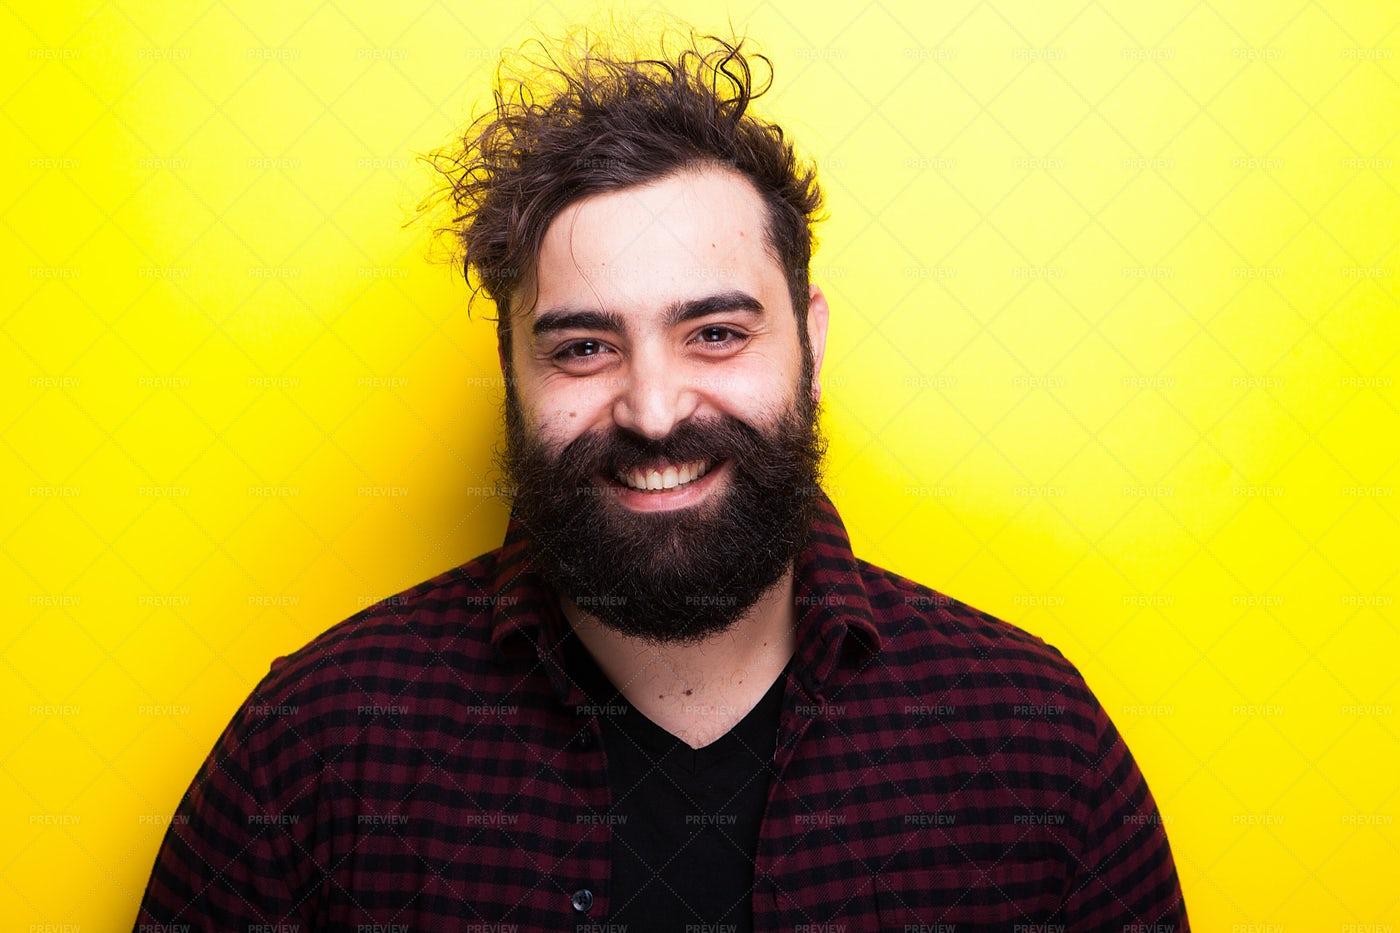 Portrait Of Smiling Bearded Man: Stock Photos